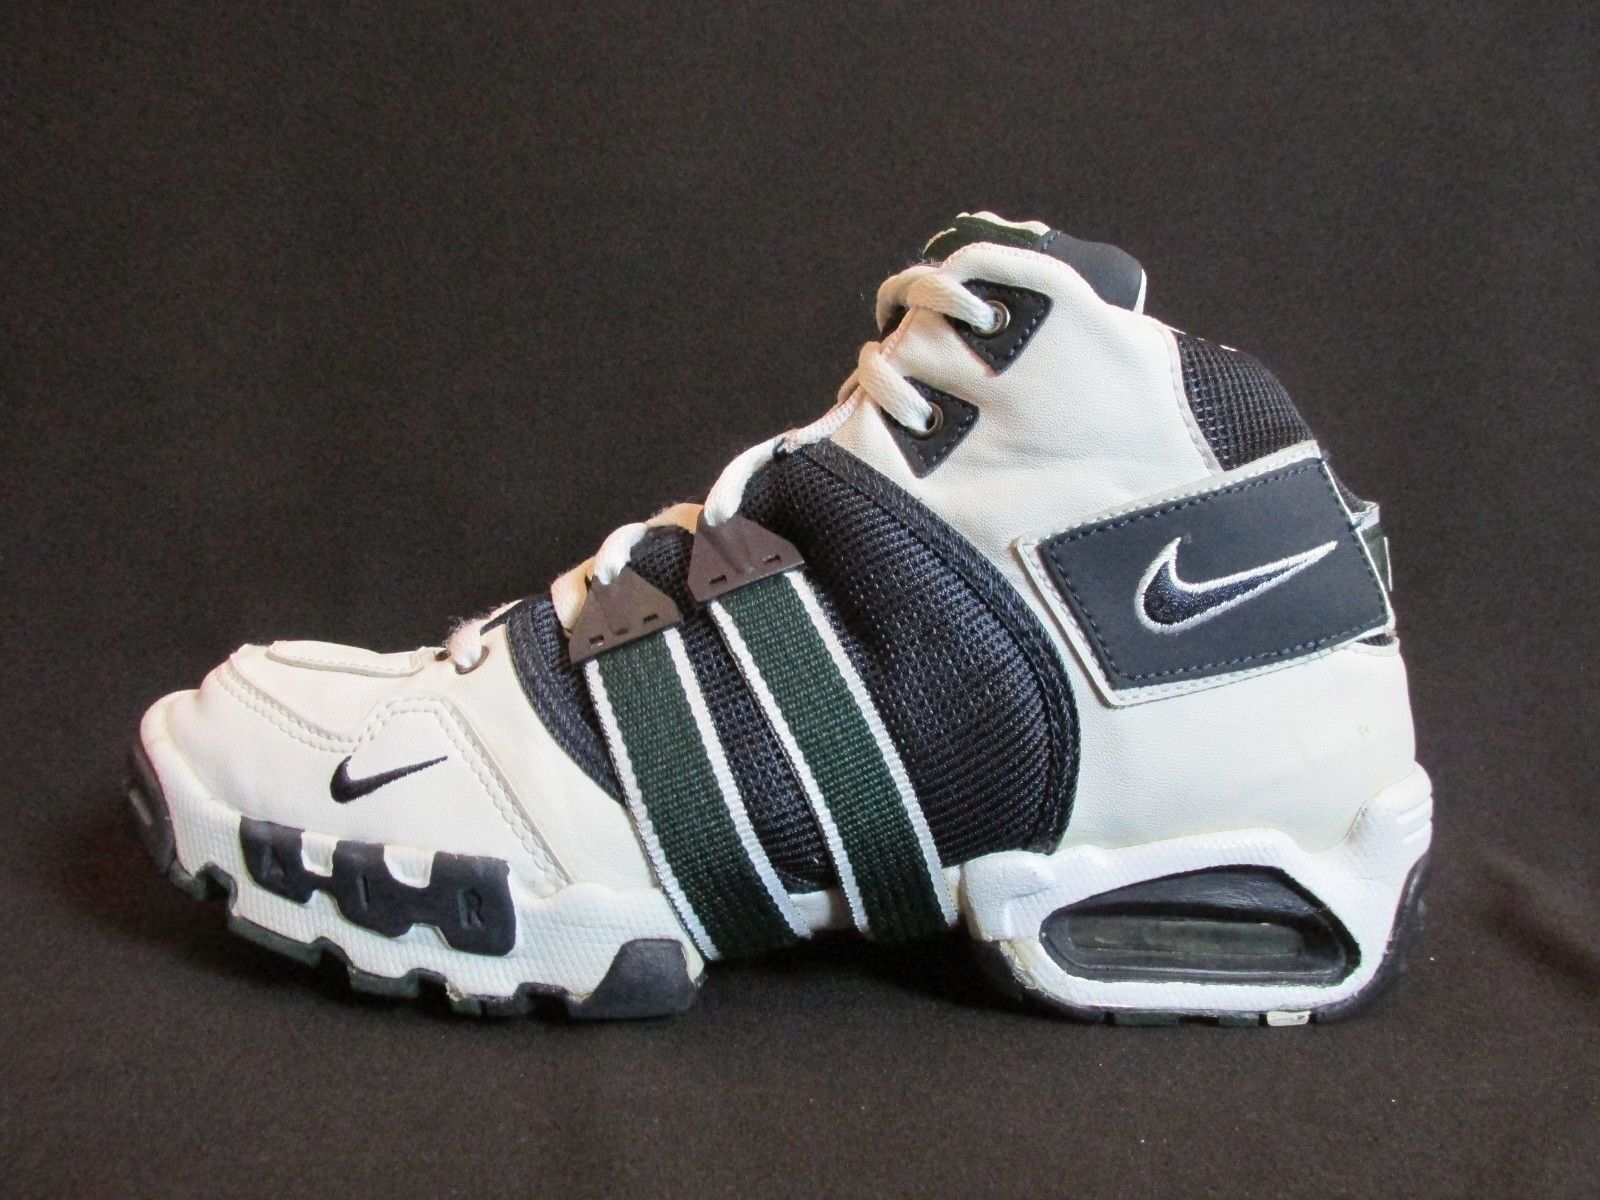 Nike 970305 ID White Leather Navy Textile Green Basketball Basketball Basketball shoes   Women's US 10 052b49